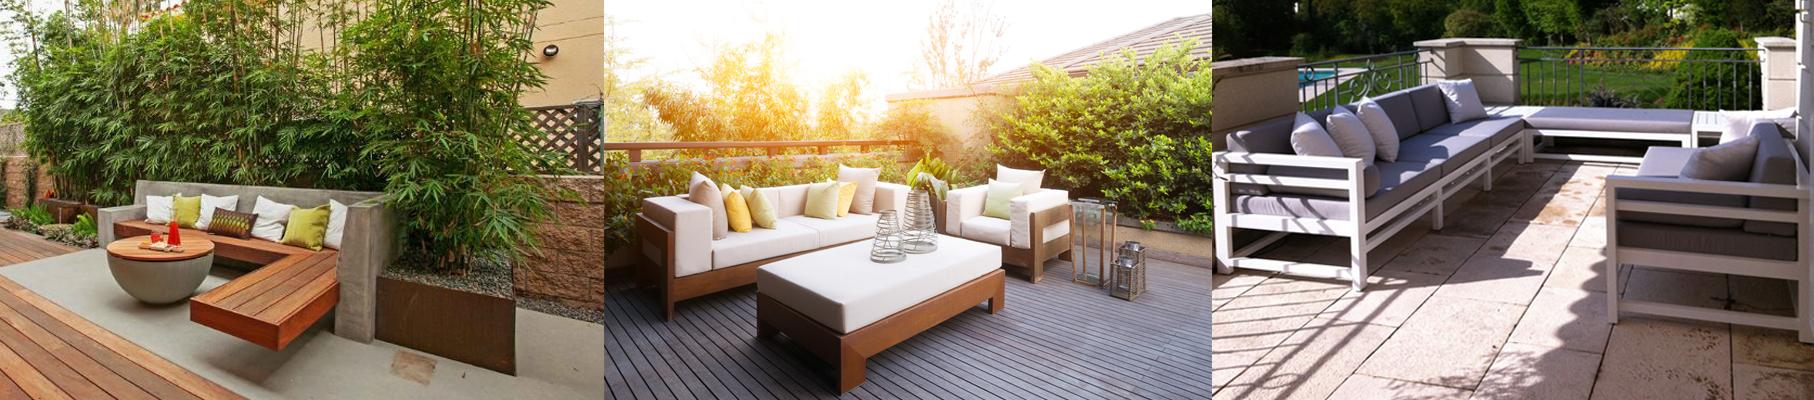 mobilier terrasse exterieur mobilier terrasse exterieur with mobilier terrasse exterieur. Black Bedroom Furniture Sets. Home Design Ideas